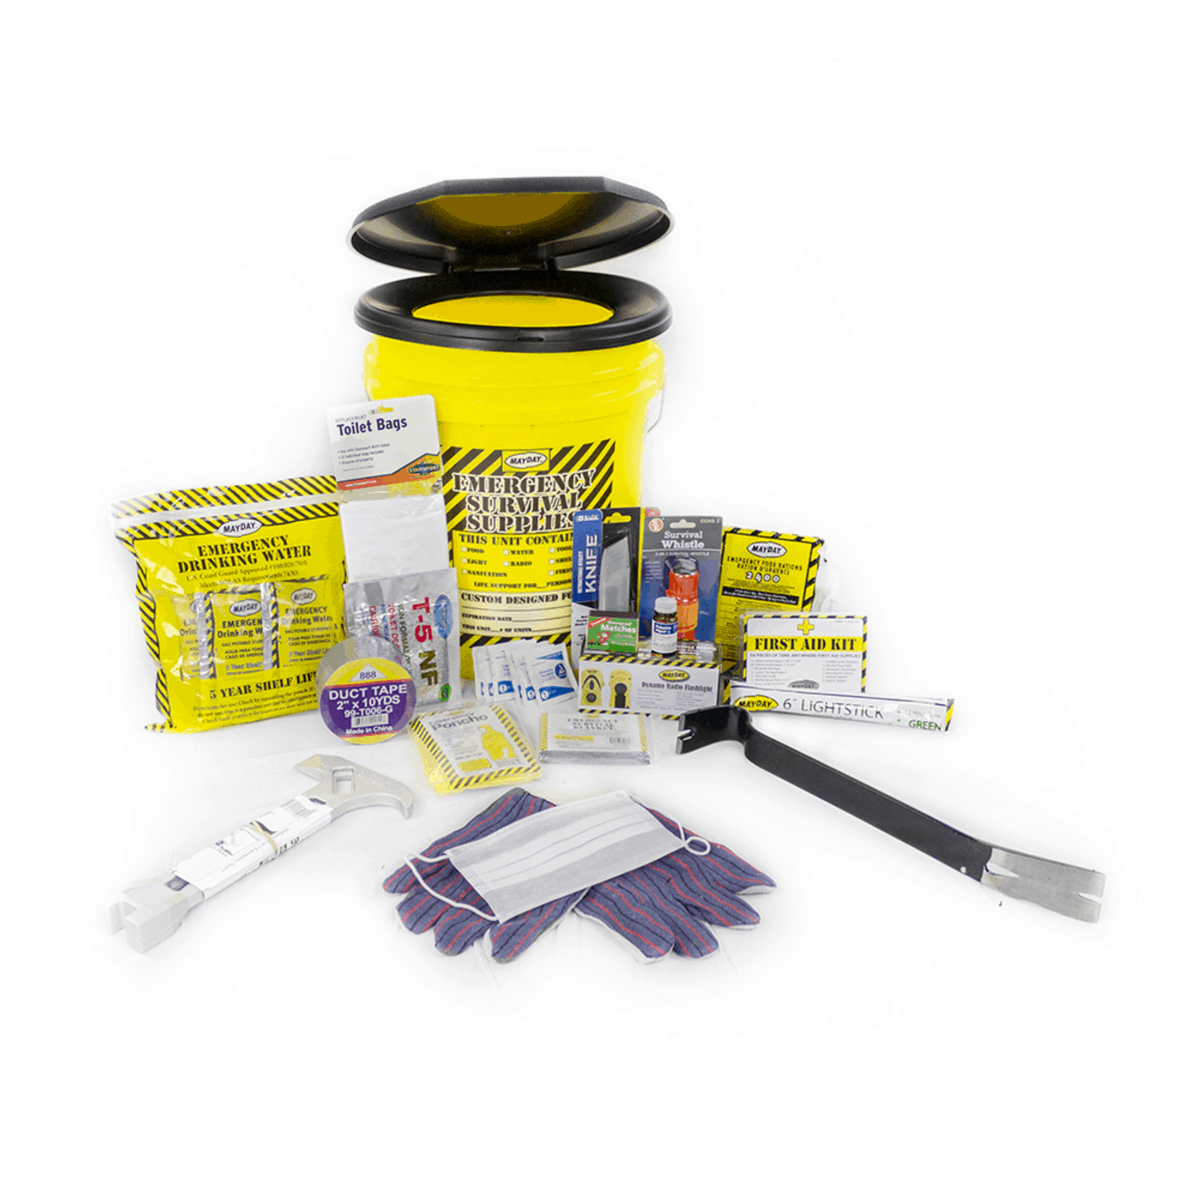 Deluxe Emergency Honey Bucket Kits (1 Person Kit)